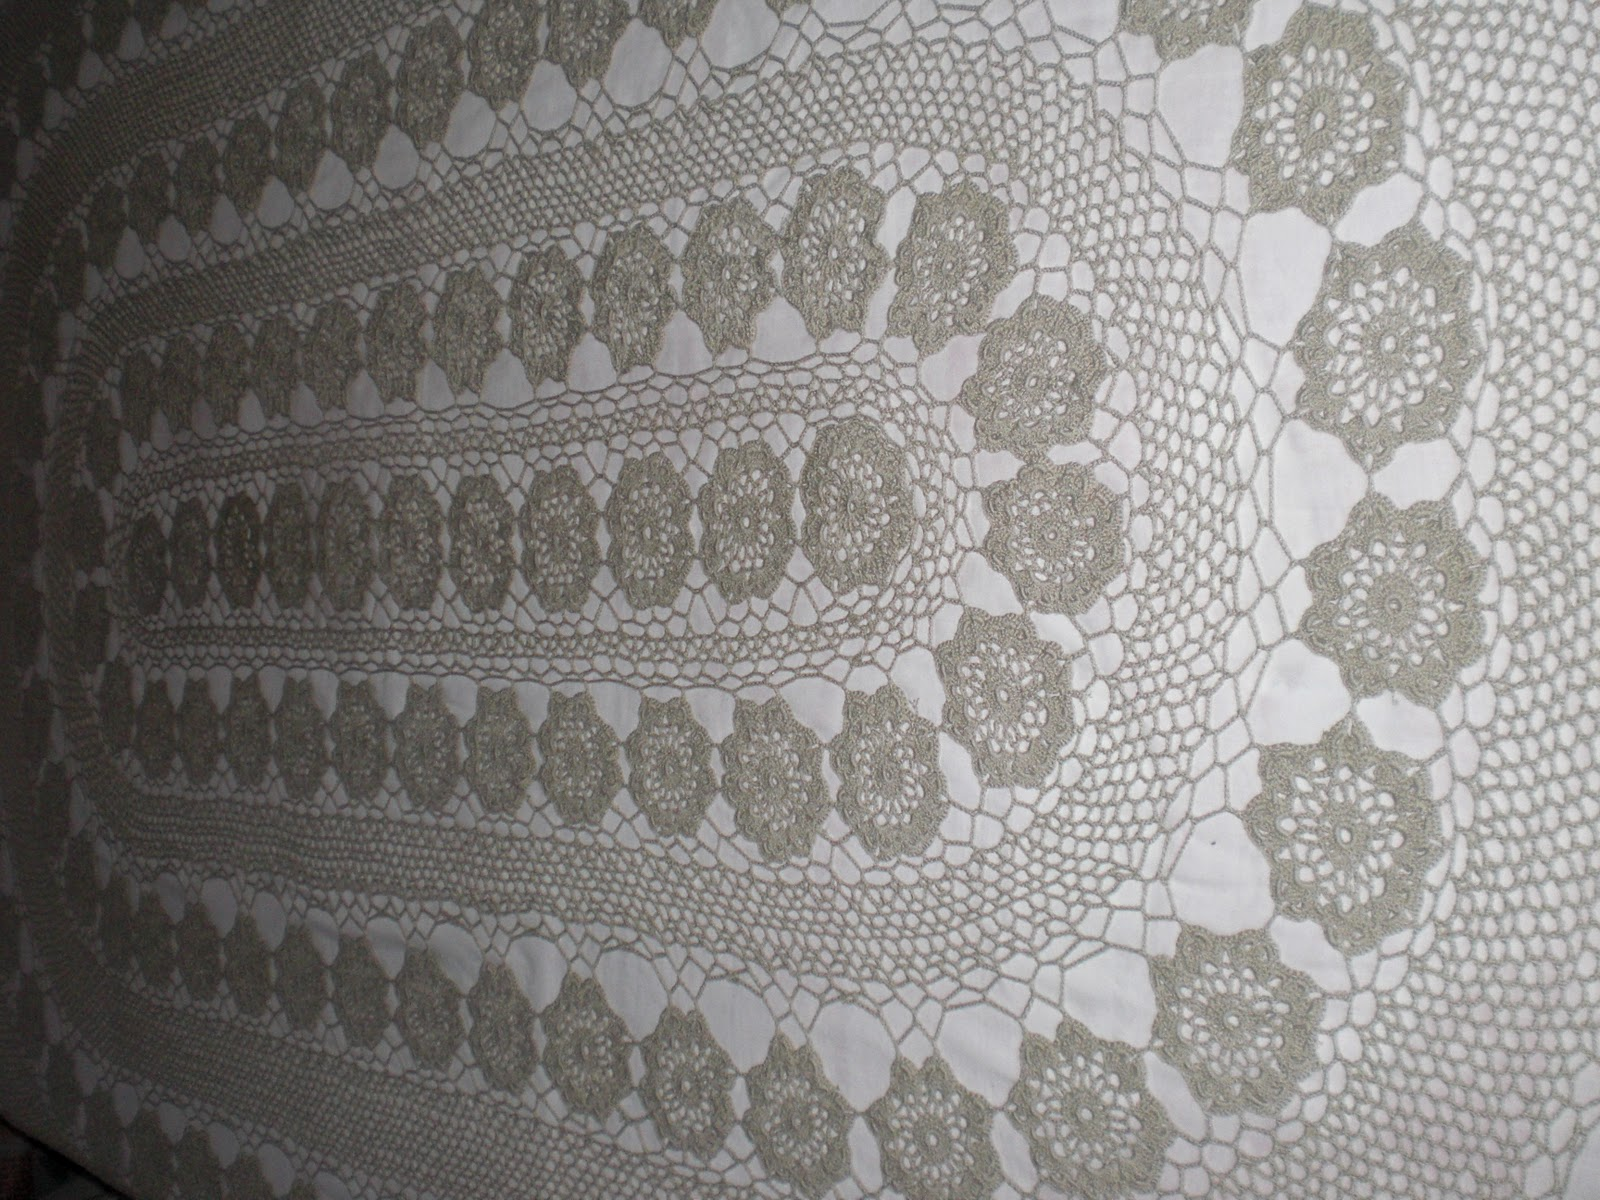 Manteles ovalados tejidos a crochet patrones gratis - Imagui